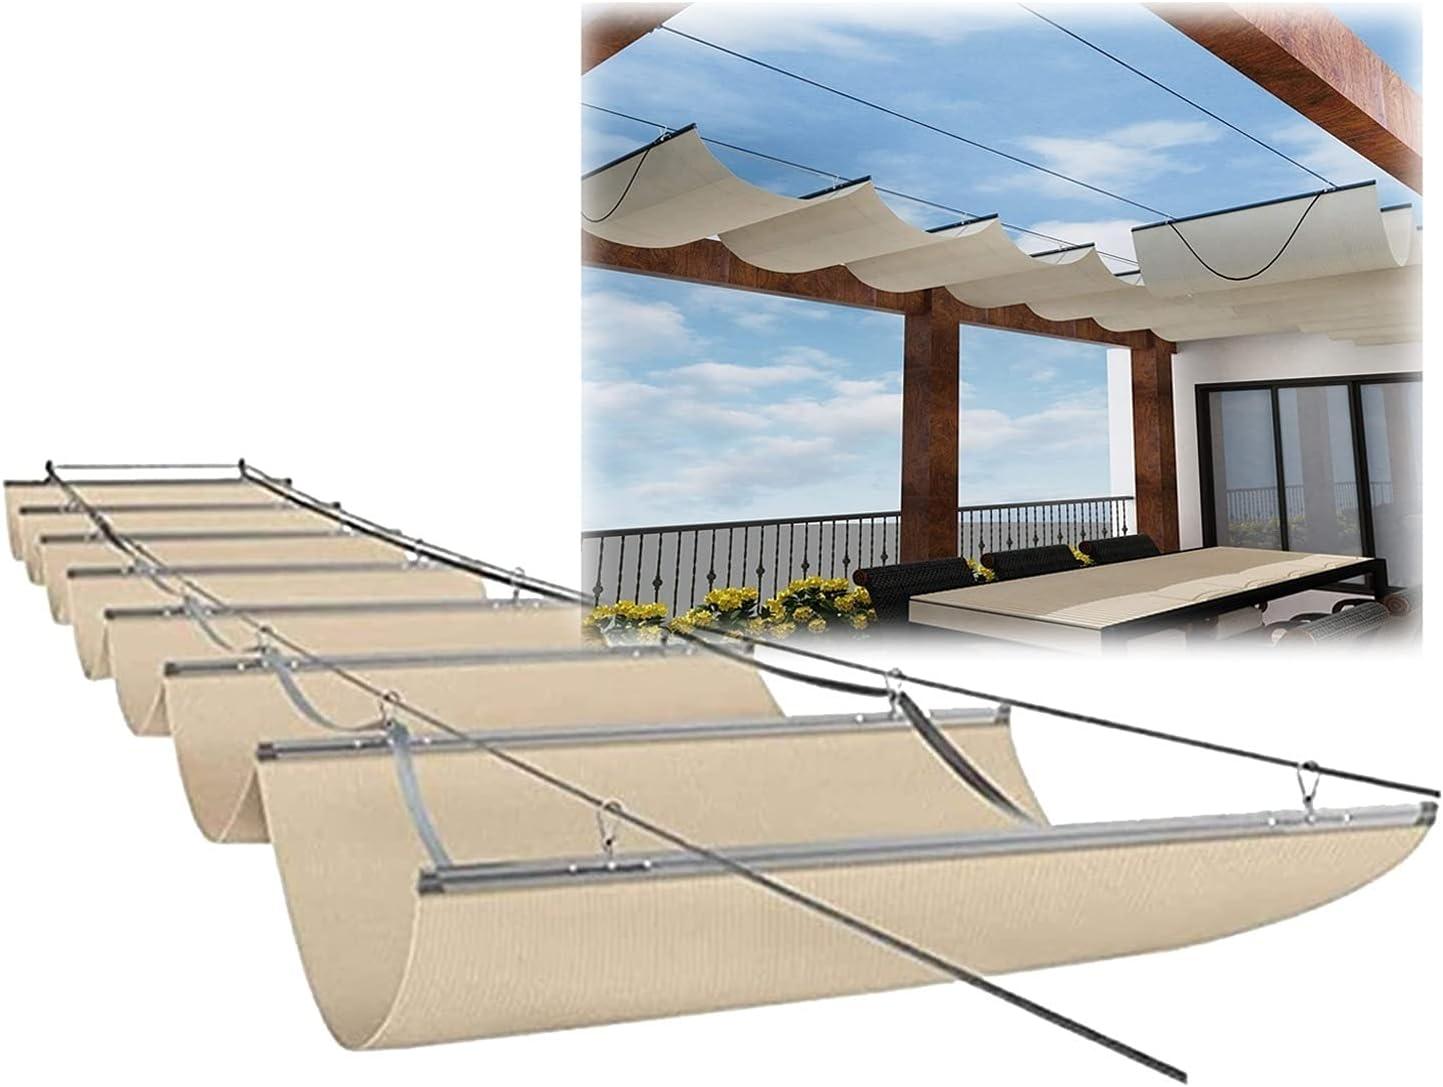 JIANFEI Max 62% OFF Pergola Shade Cover Deck Anti-UV Shadin Sale price Outdoor Hanging